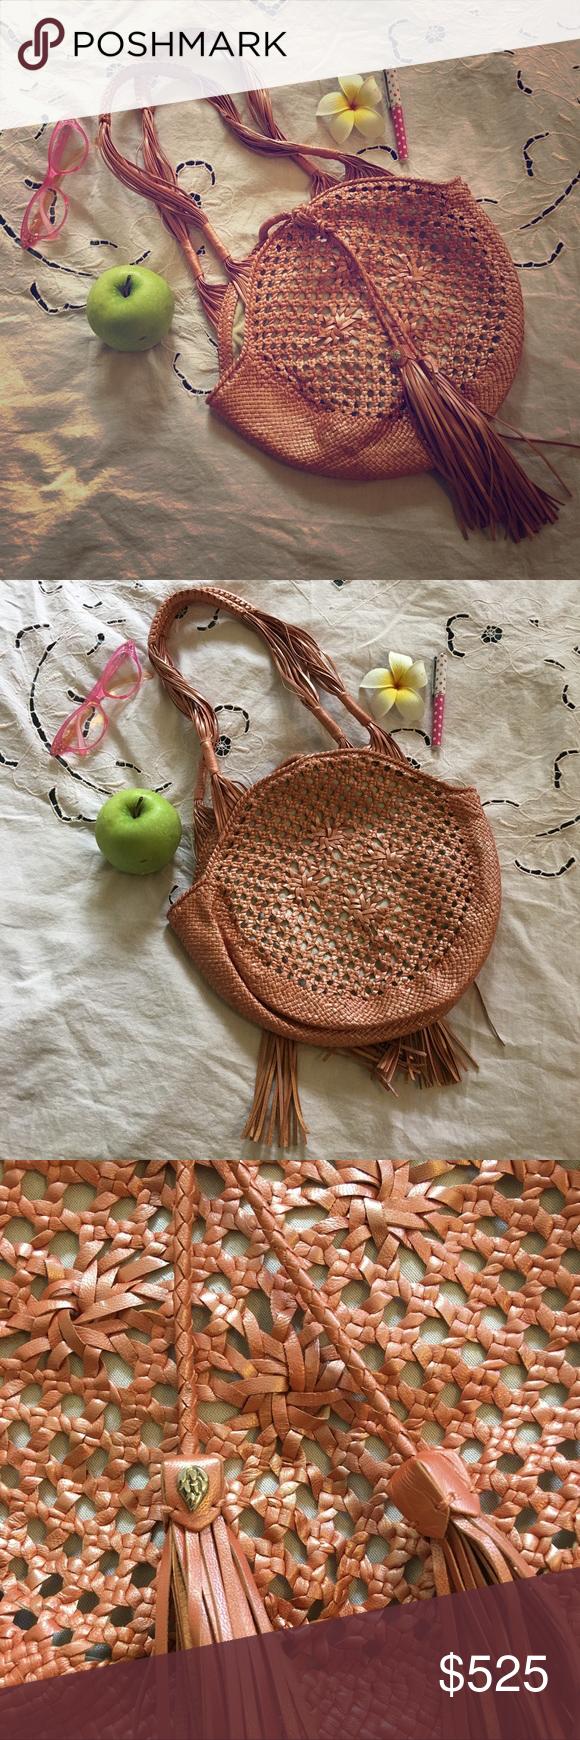 HELEN KAMINSKI woven coppery peach leather purse